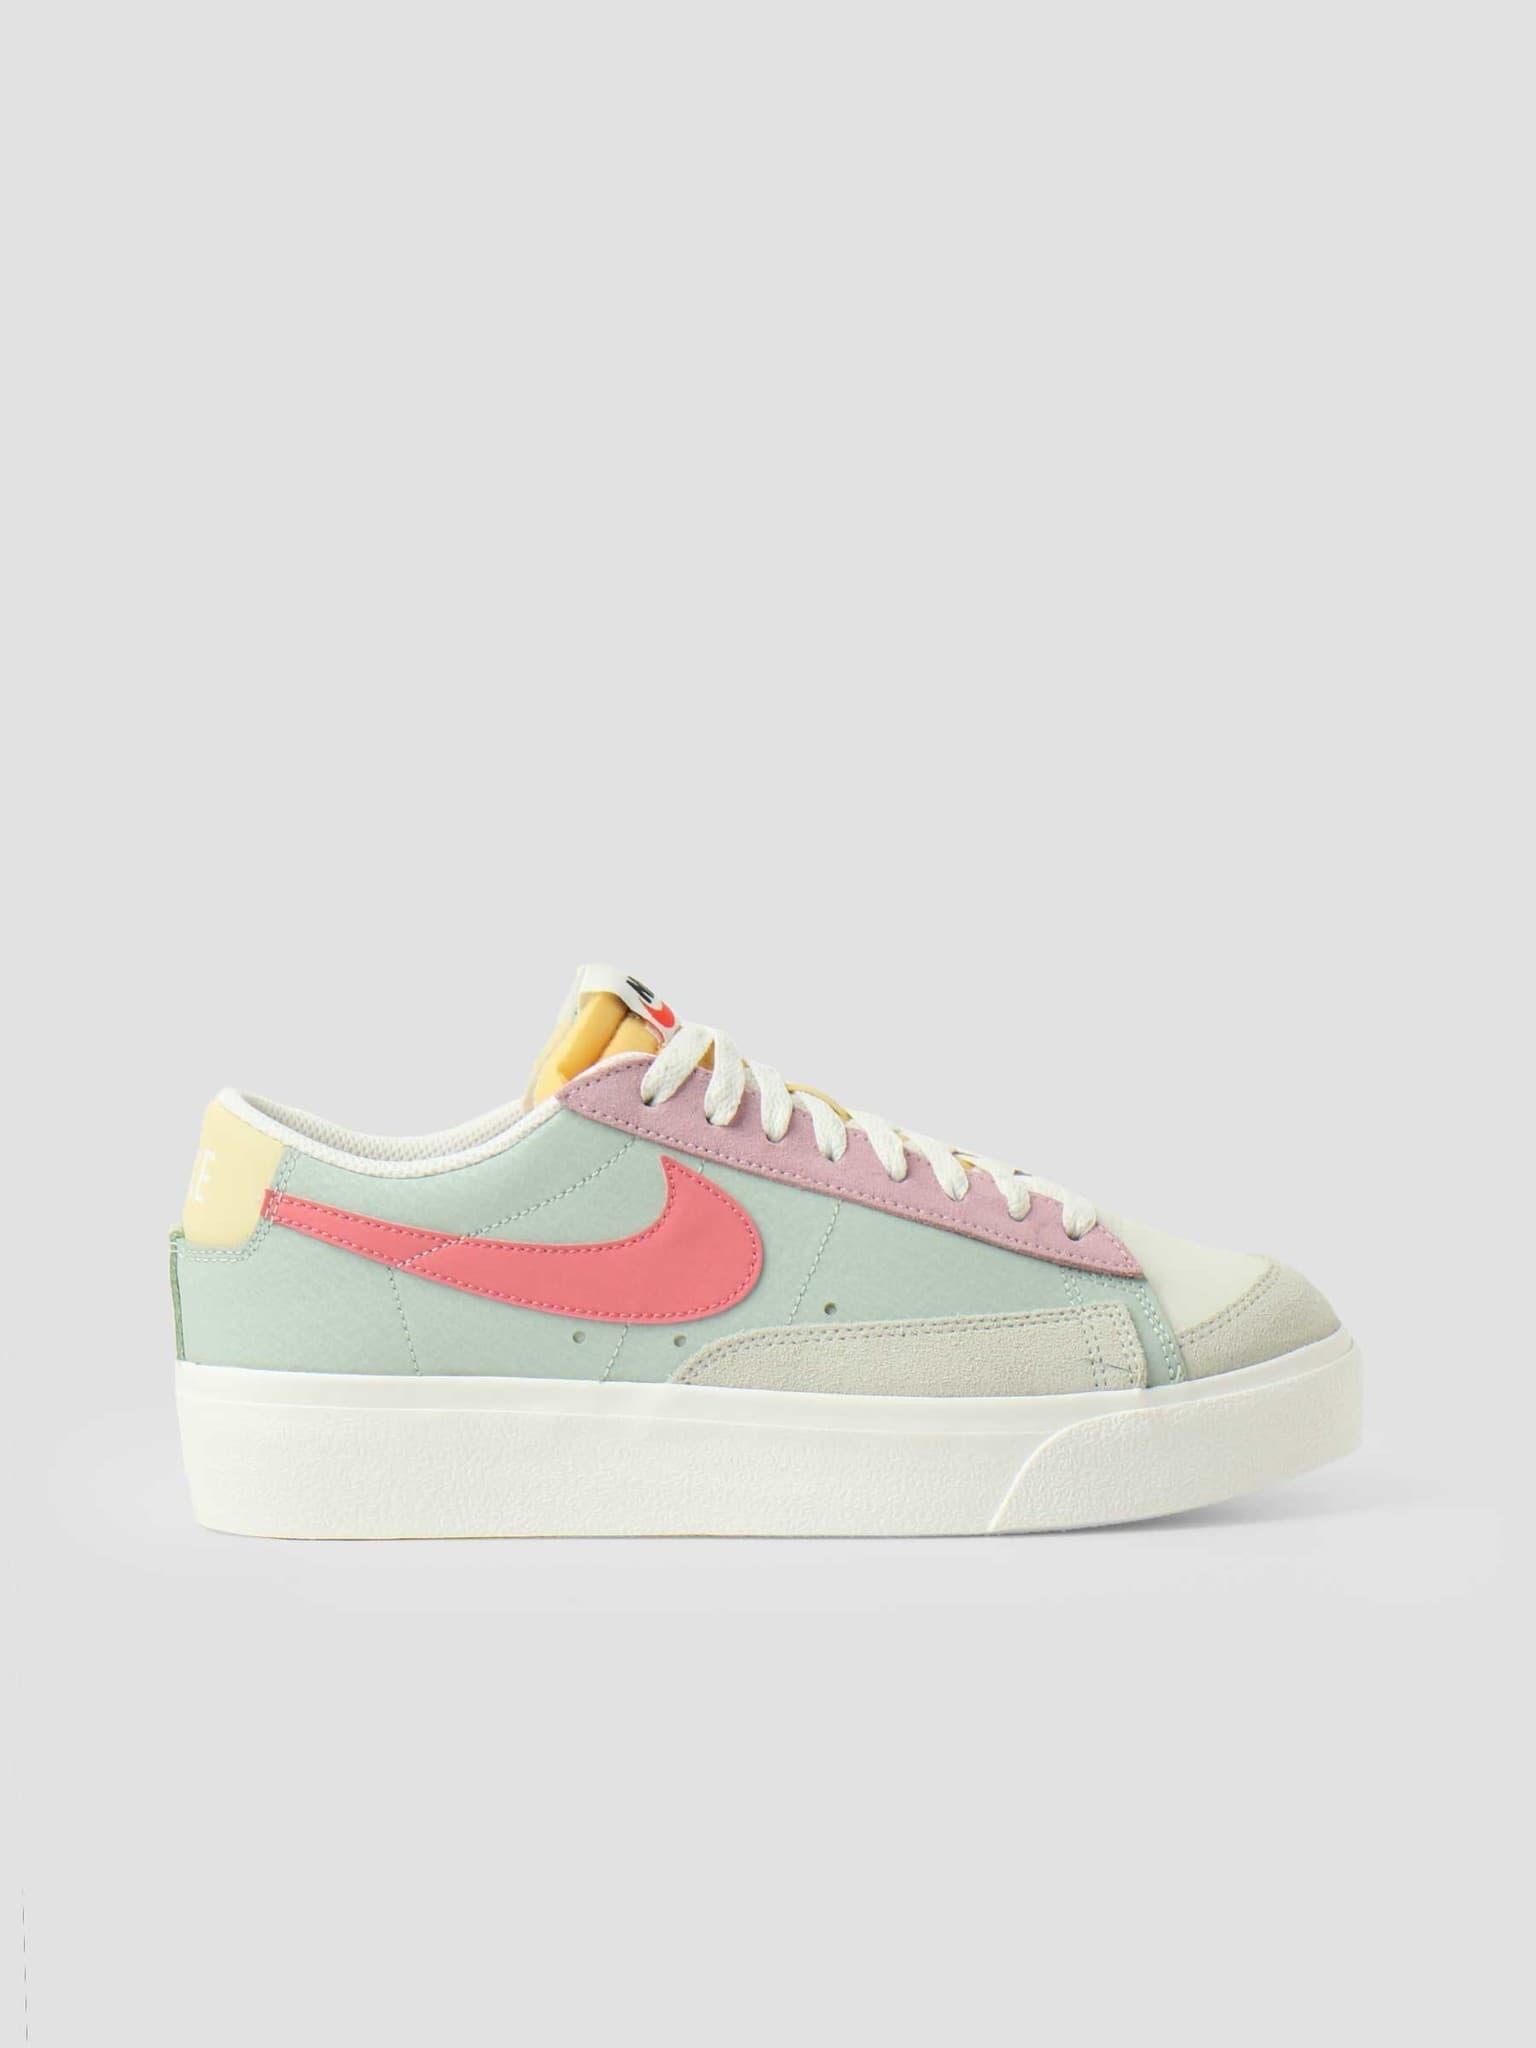 Wmns Nike Blazer Low Platform Seafoam Pink Salt Sea Glass Saturn Gold DM9464-001